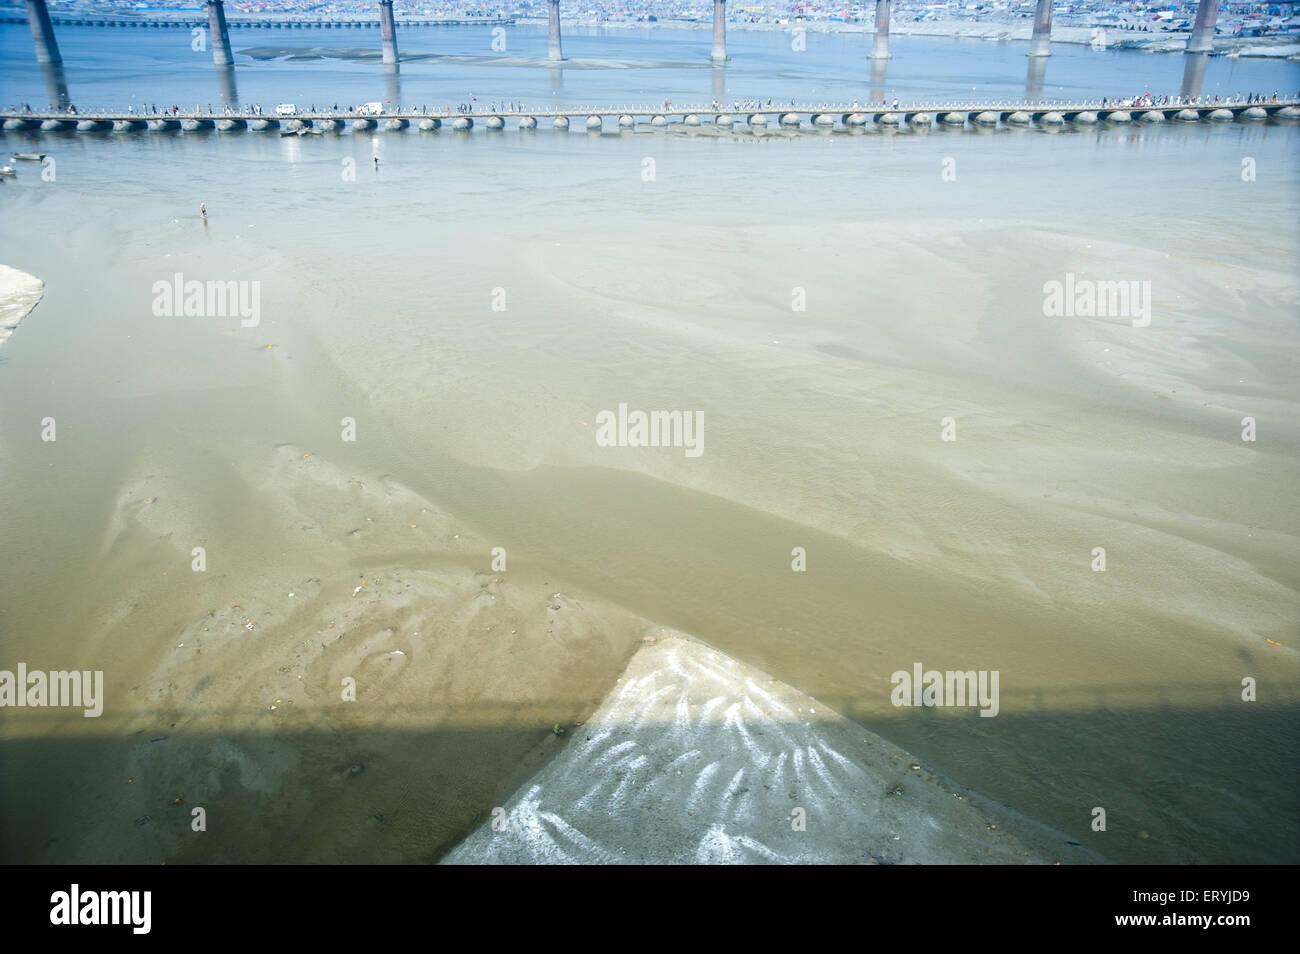 Pontoon Bridges at allahabad uttar pradesh India - Stock Image